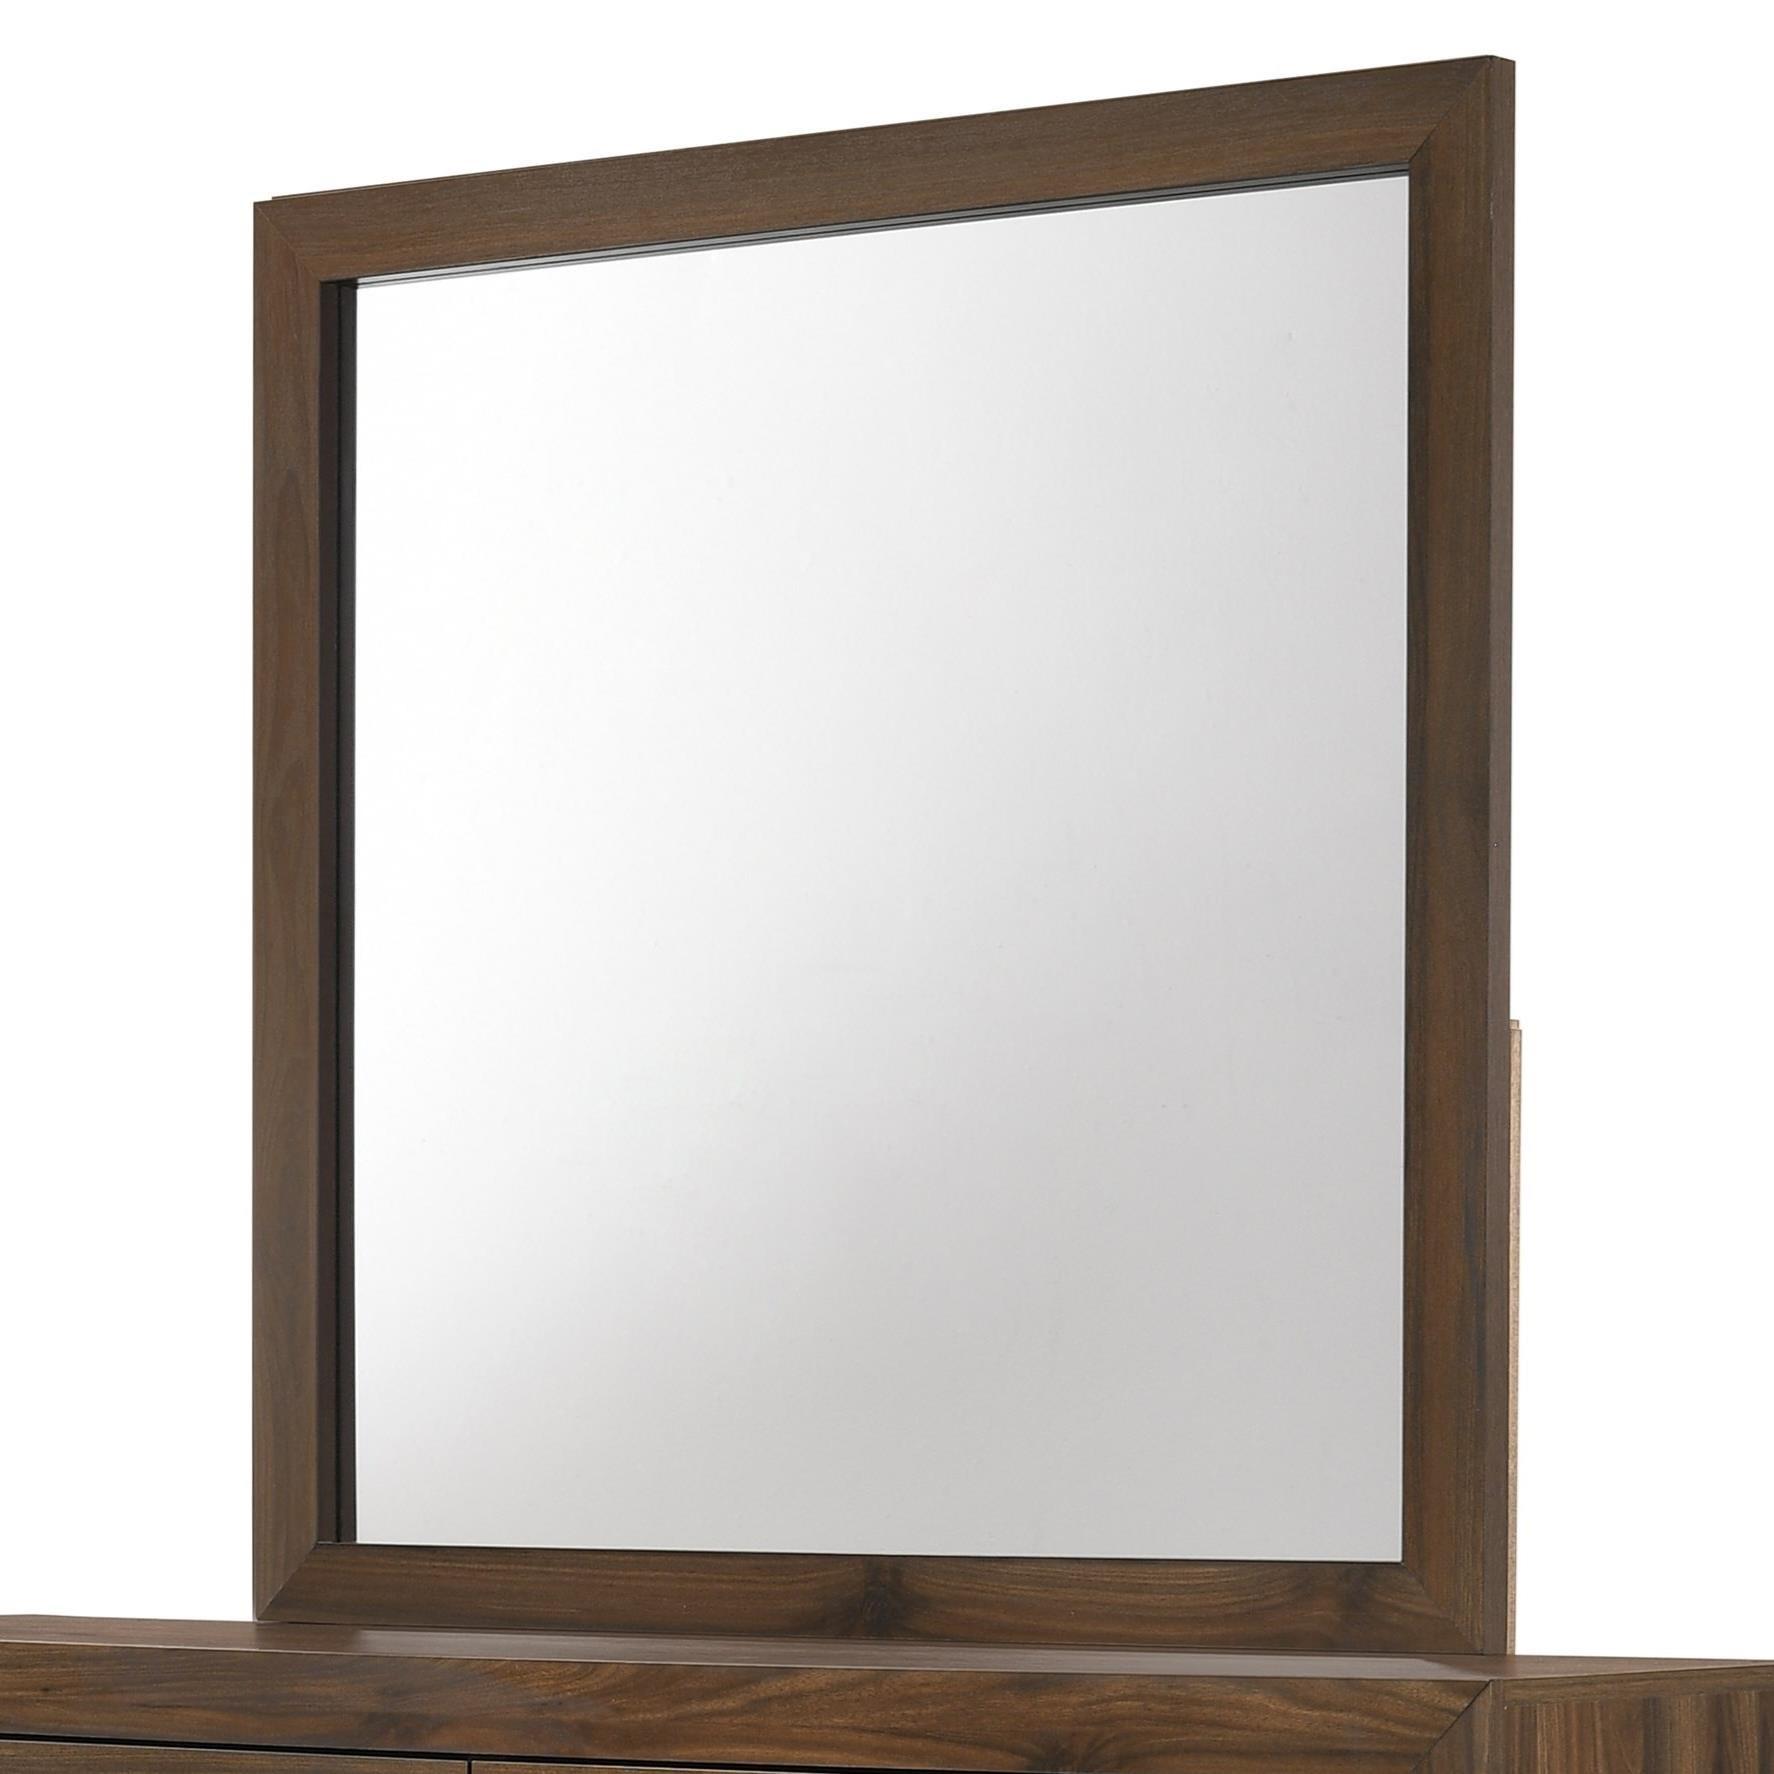 Millie Dresser Mirror by Crown Mark at Northeast Factory Direct